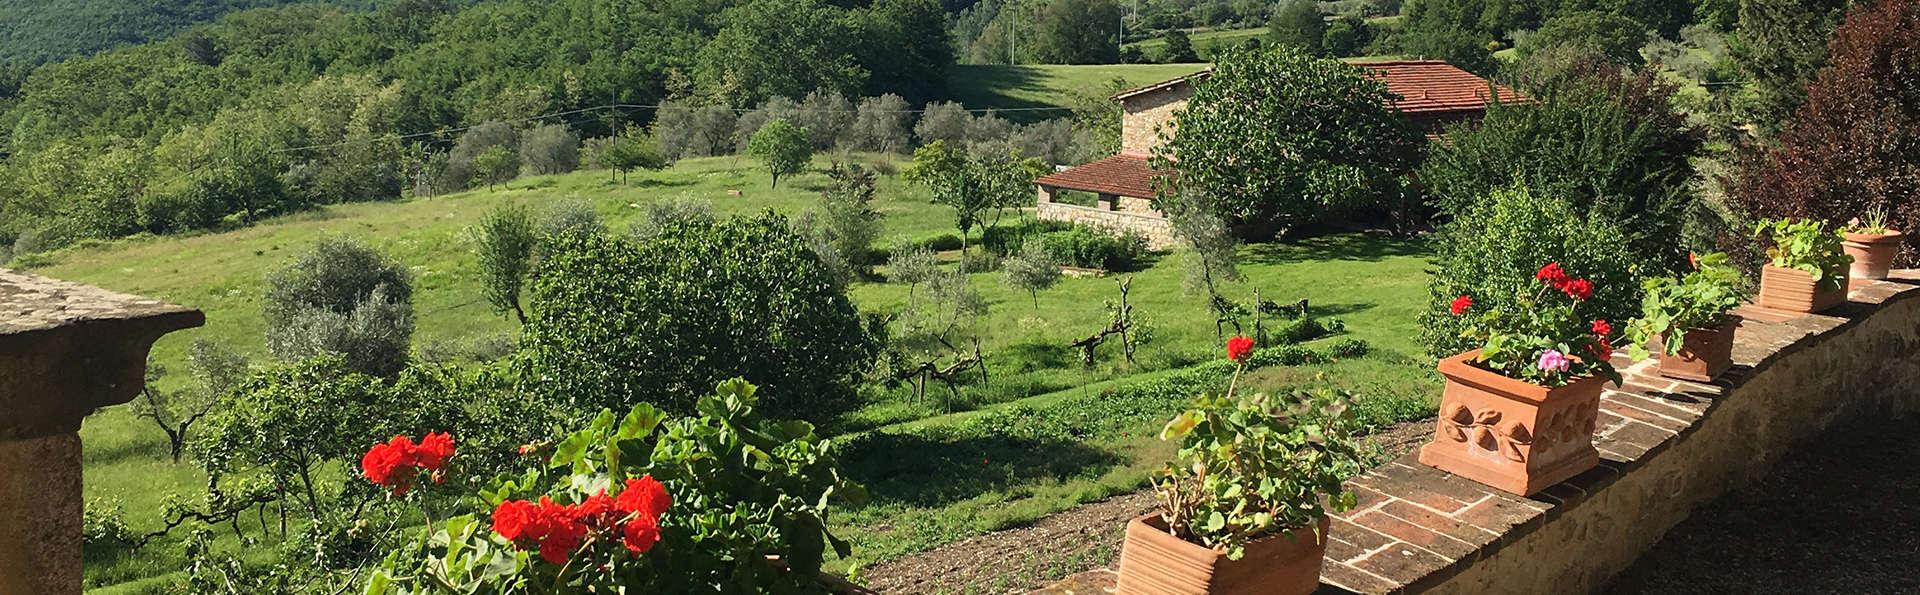 I Casali del Trebbiolo - EDIT_NEW_exterior1.jpg